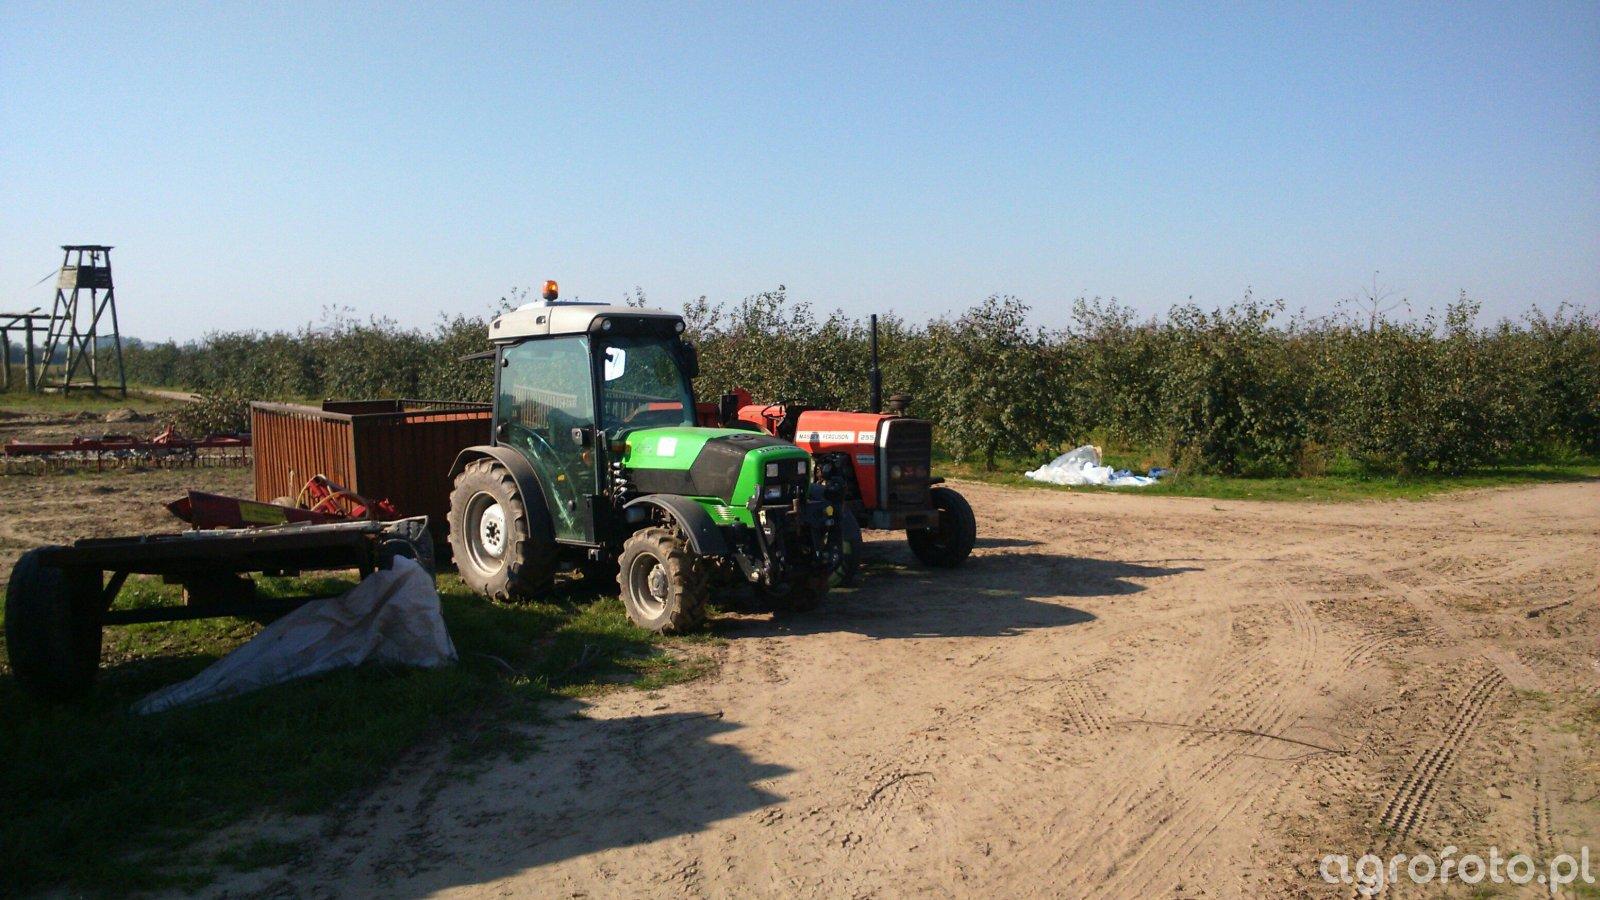 Deutz-Fahr agroplus 320s i massey ferguson 255